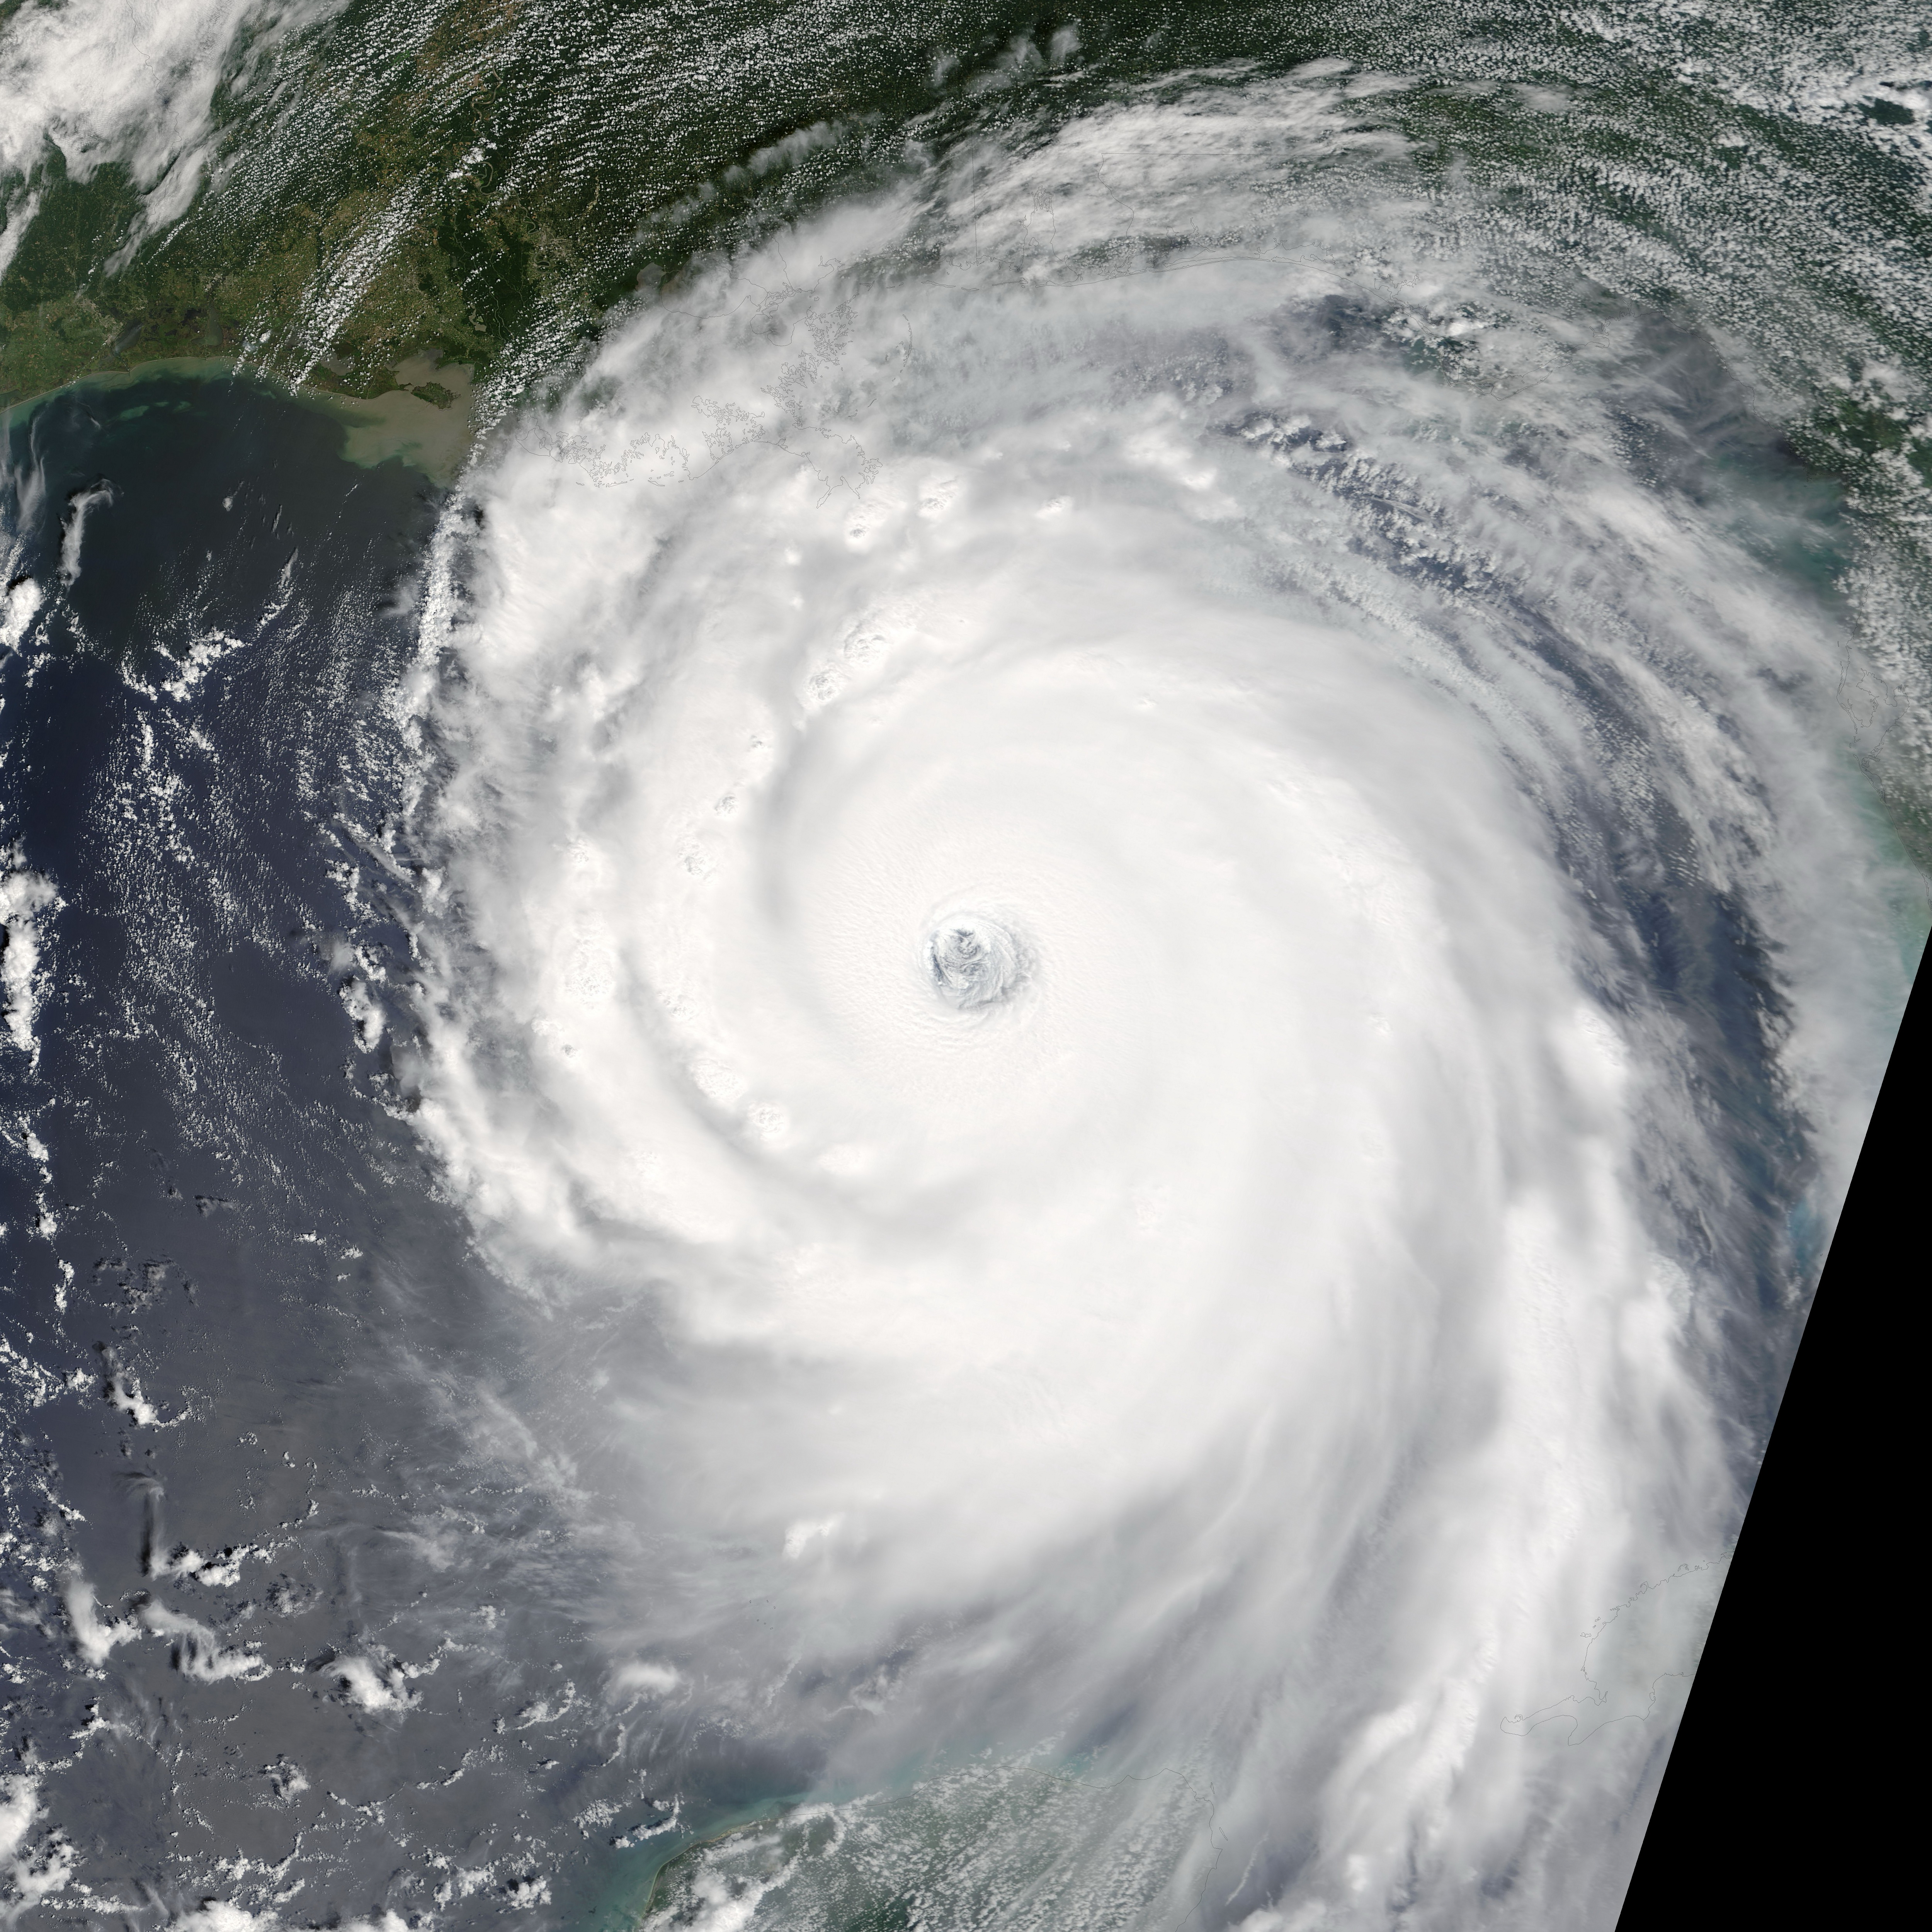 descriptive essay on hurricane katrina